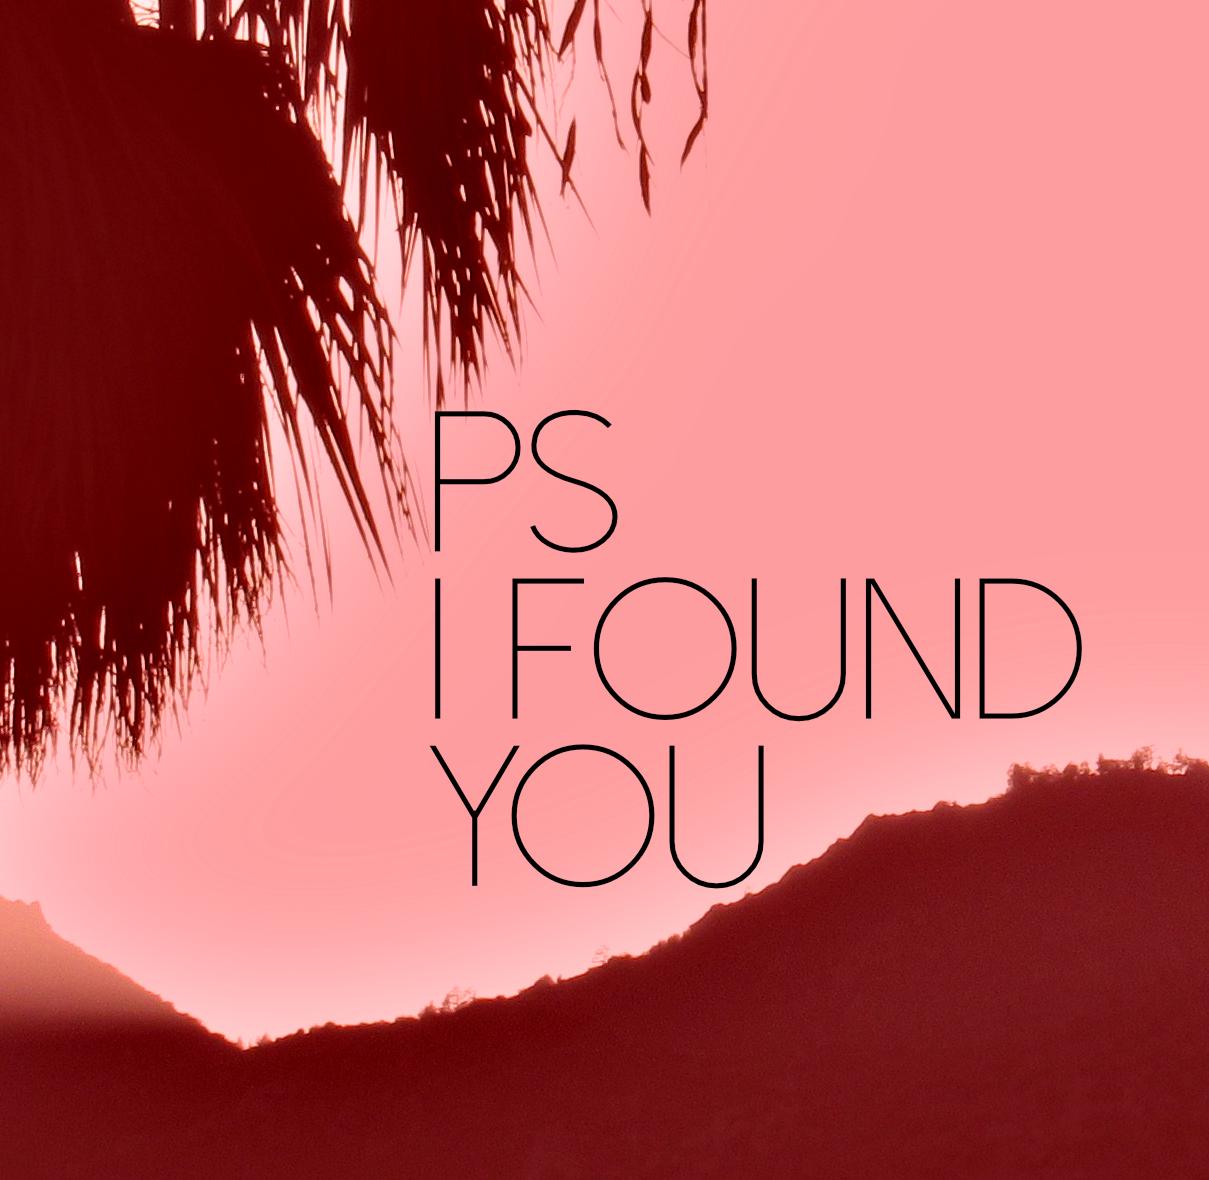 PS I Found You